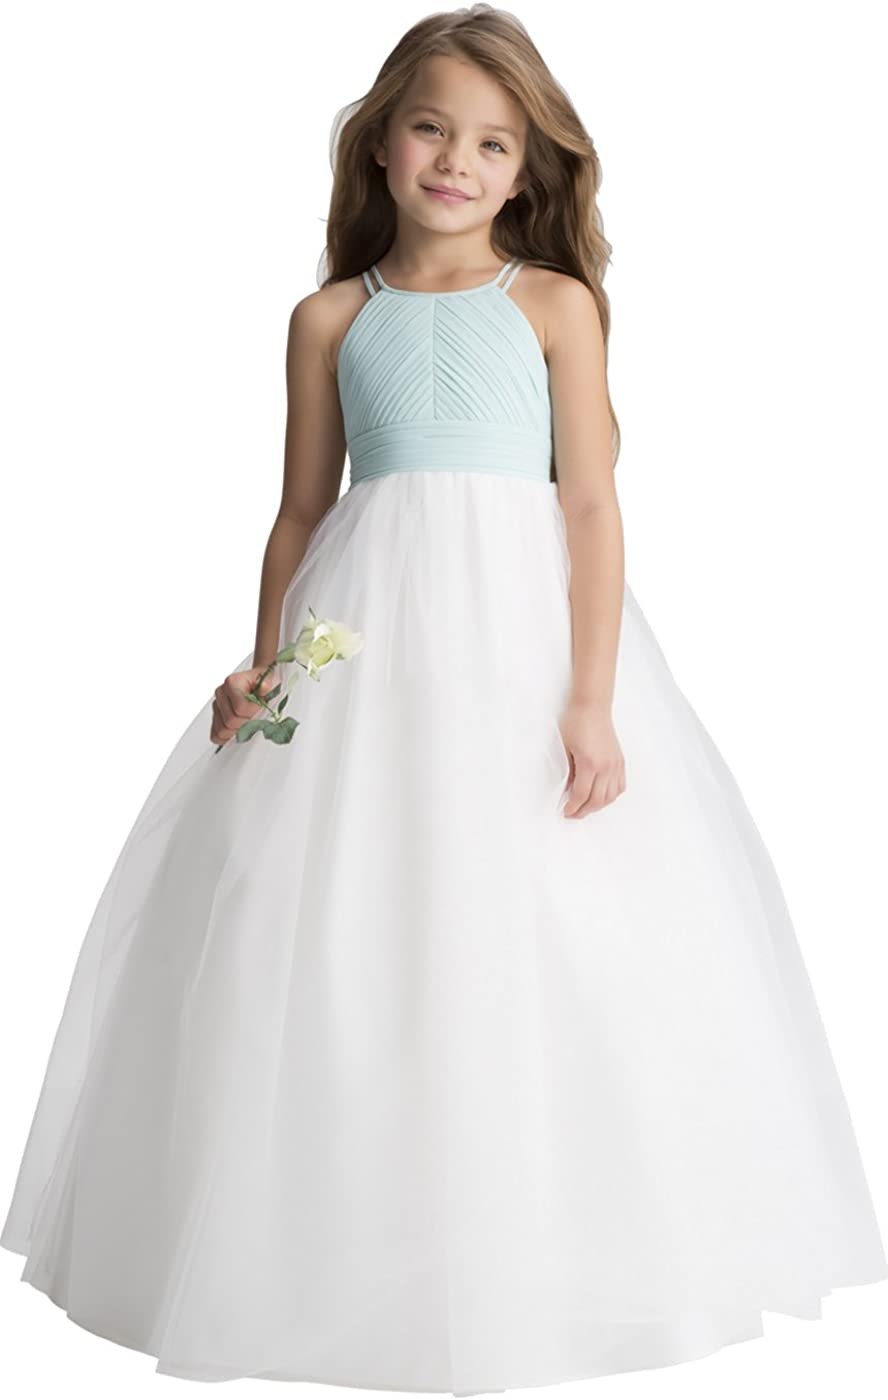 Miama Blue Chiffon Tulle Wedding Flower Girl Dress Junior Bridesmaid Dress